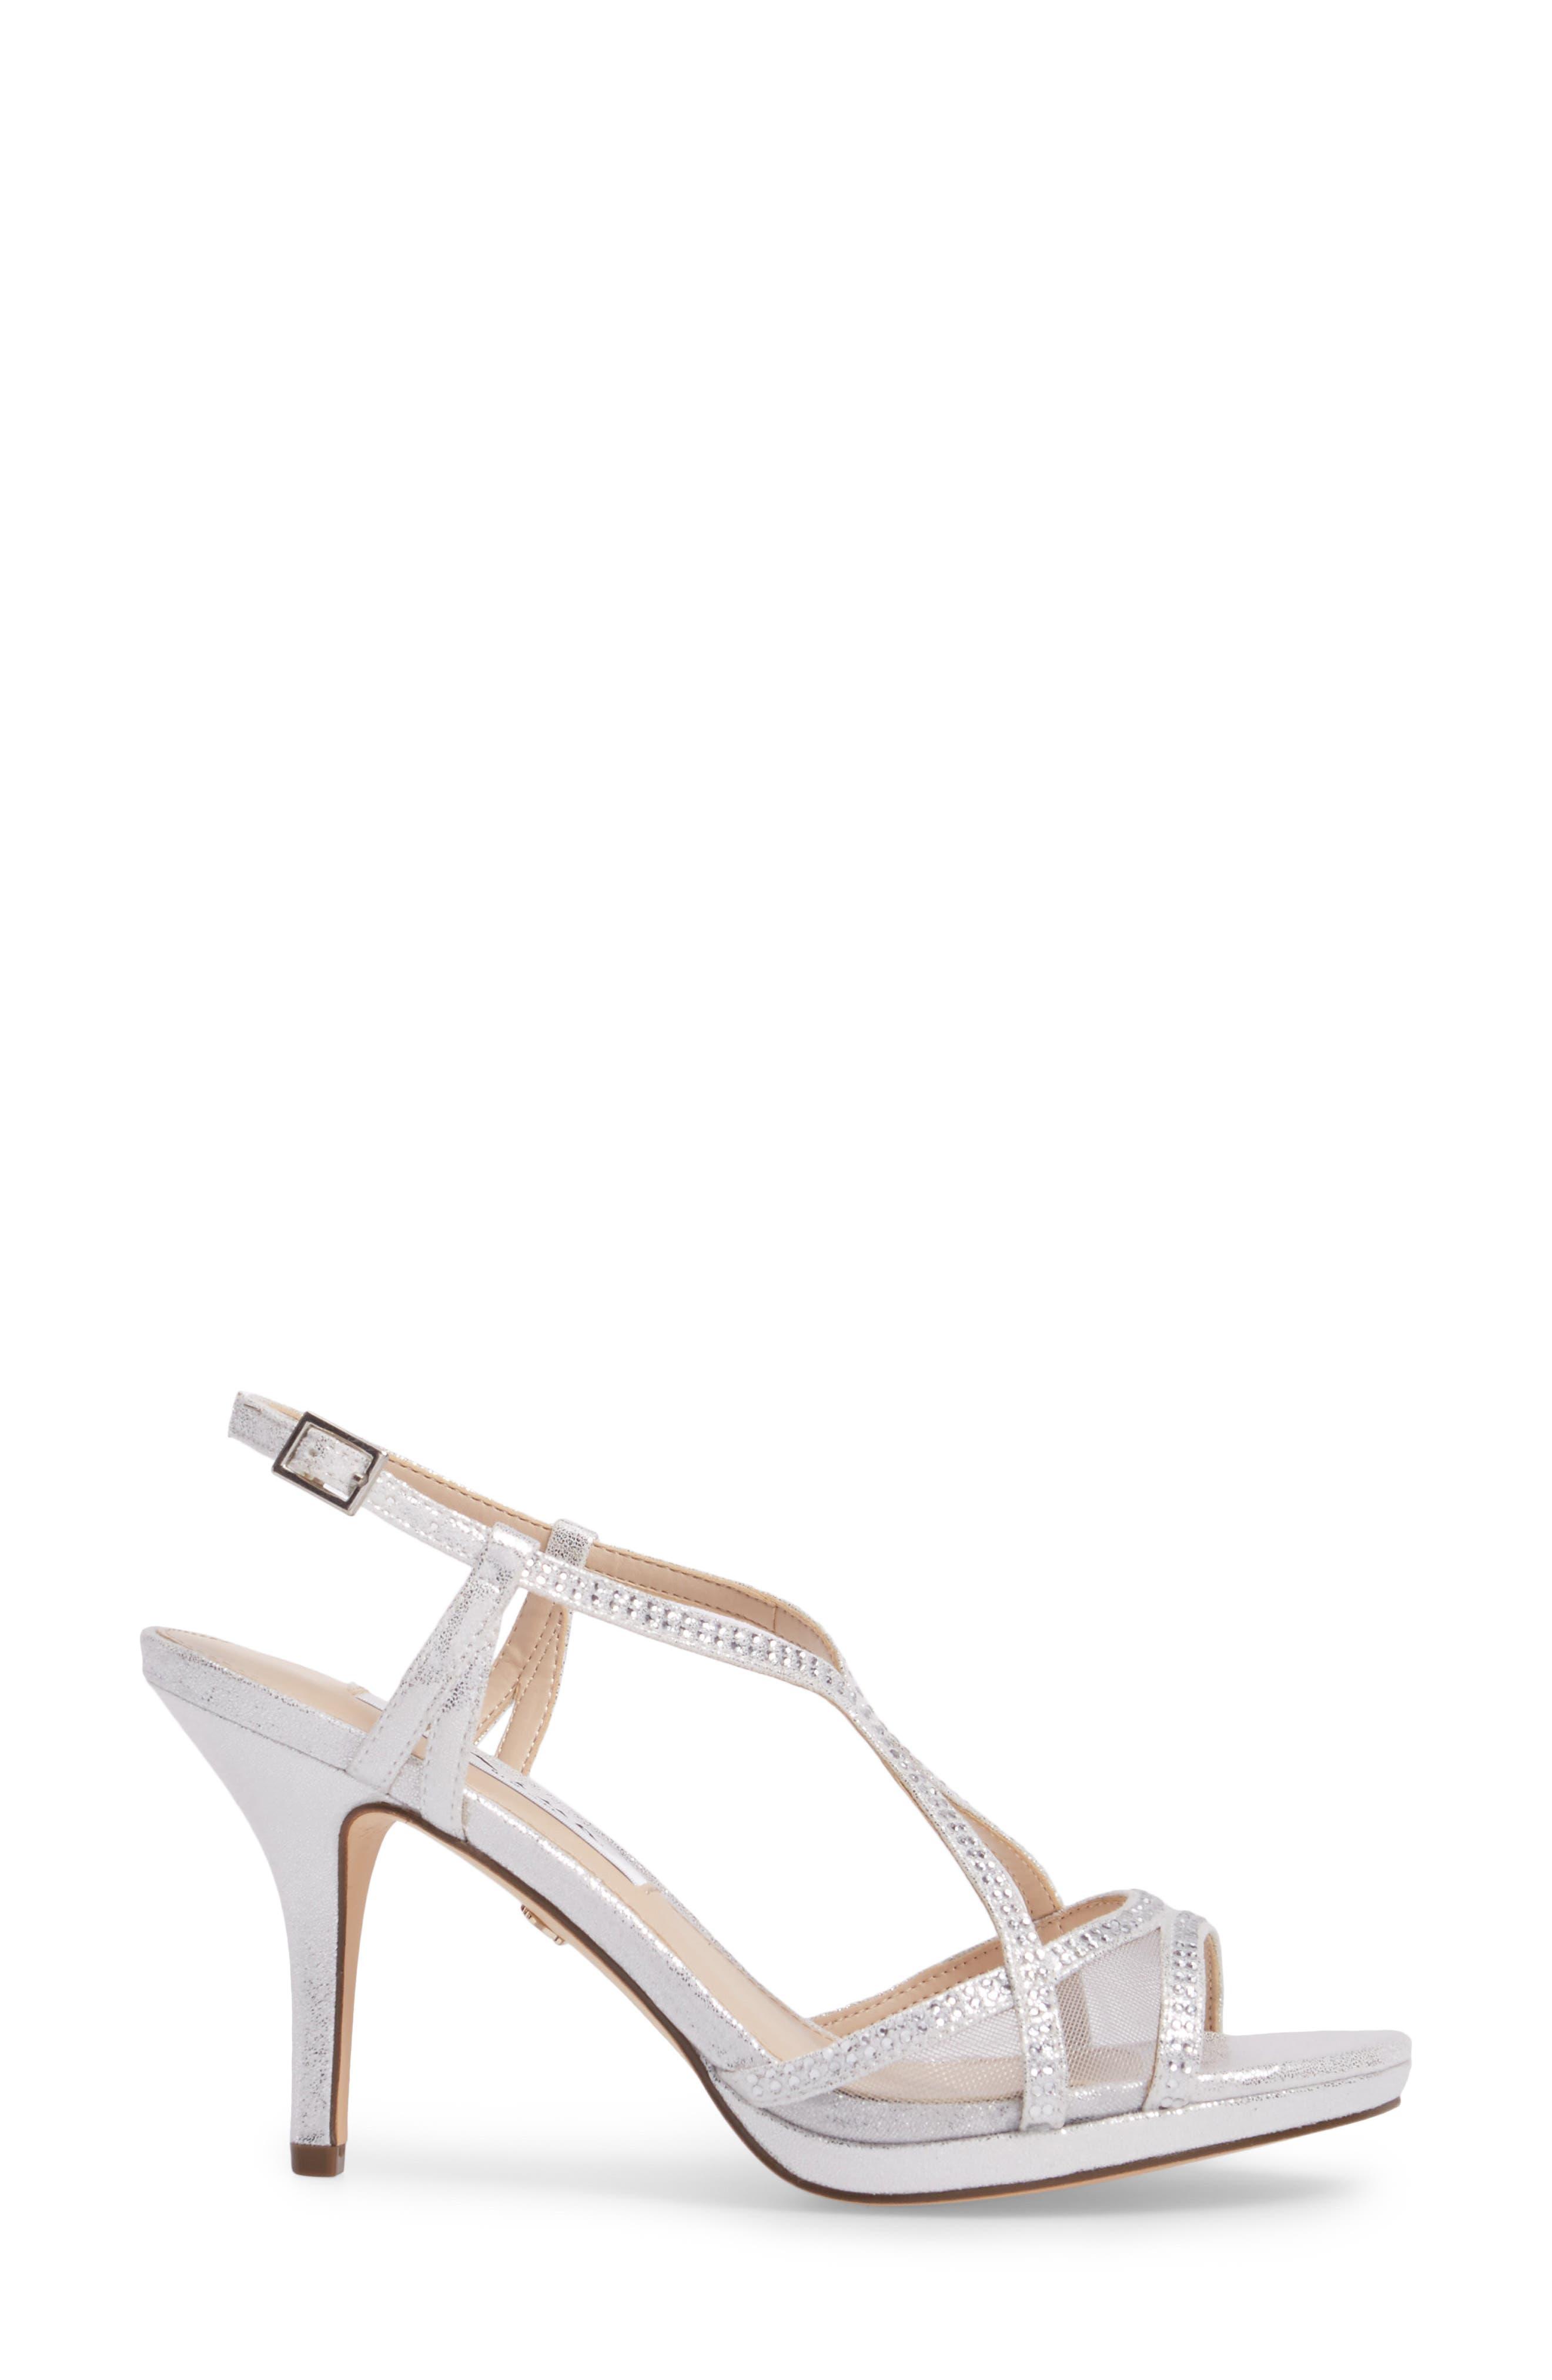 NINA, Blossom Crystal Embellished Sandal, Alternate thumbnail 3, color, SILVER FABRIC